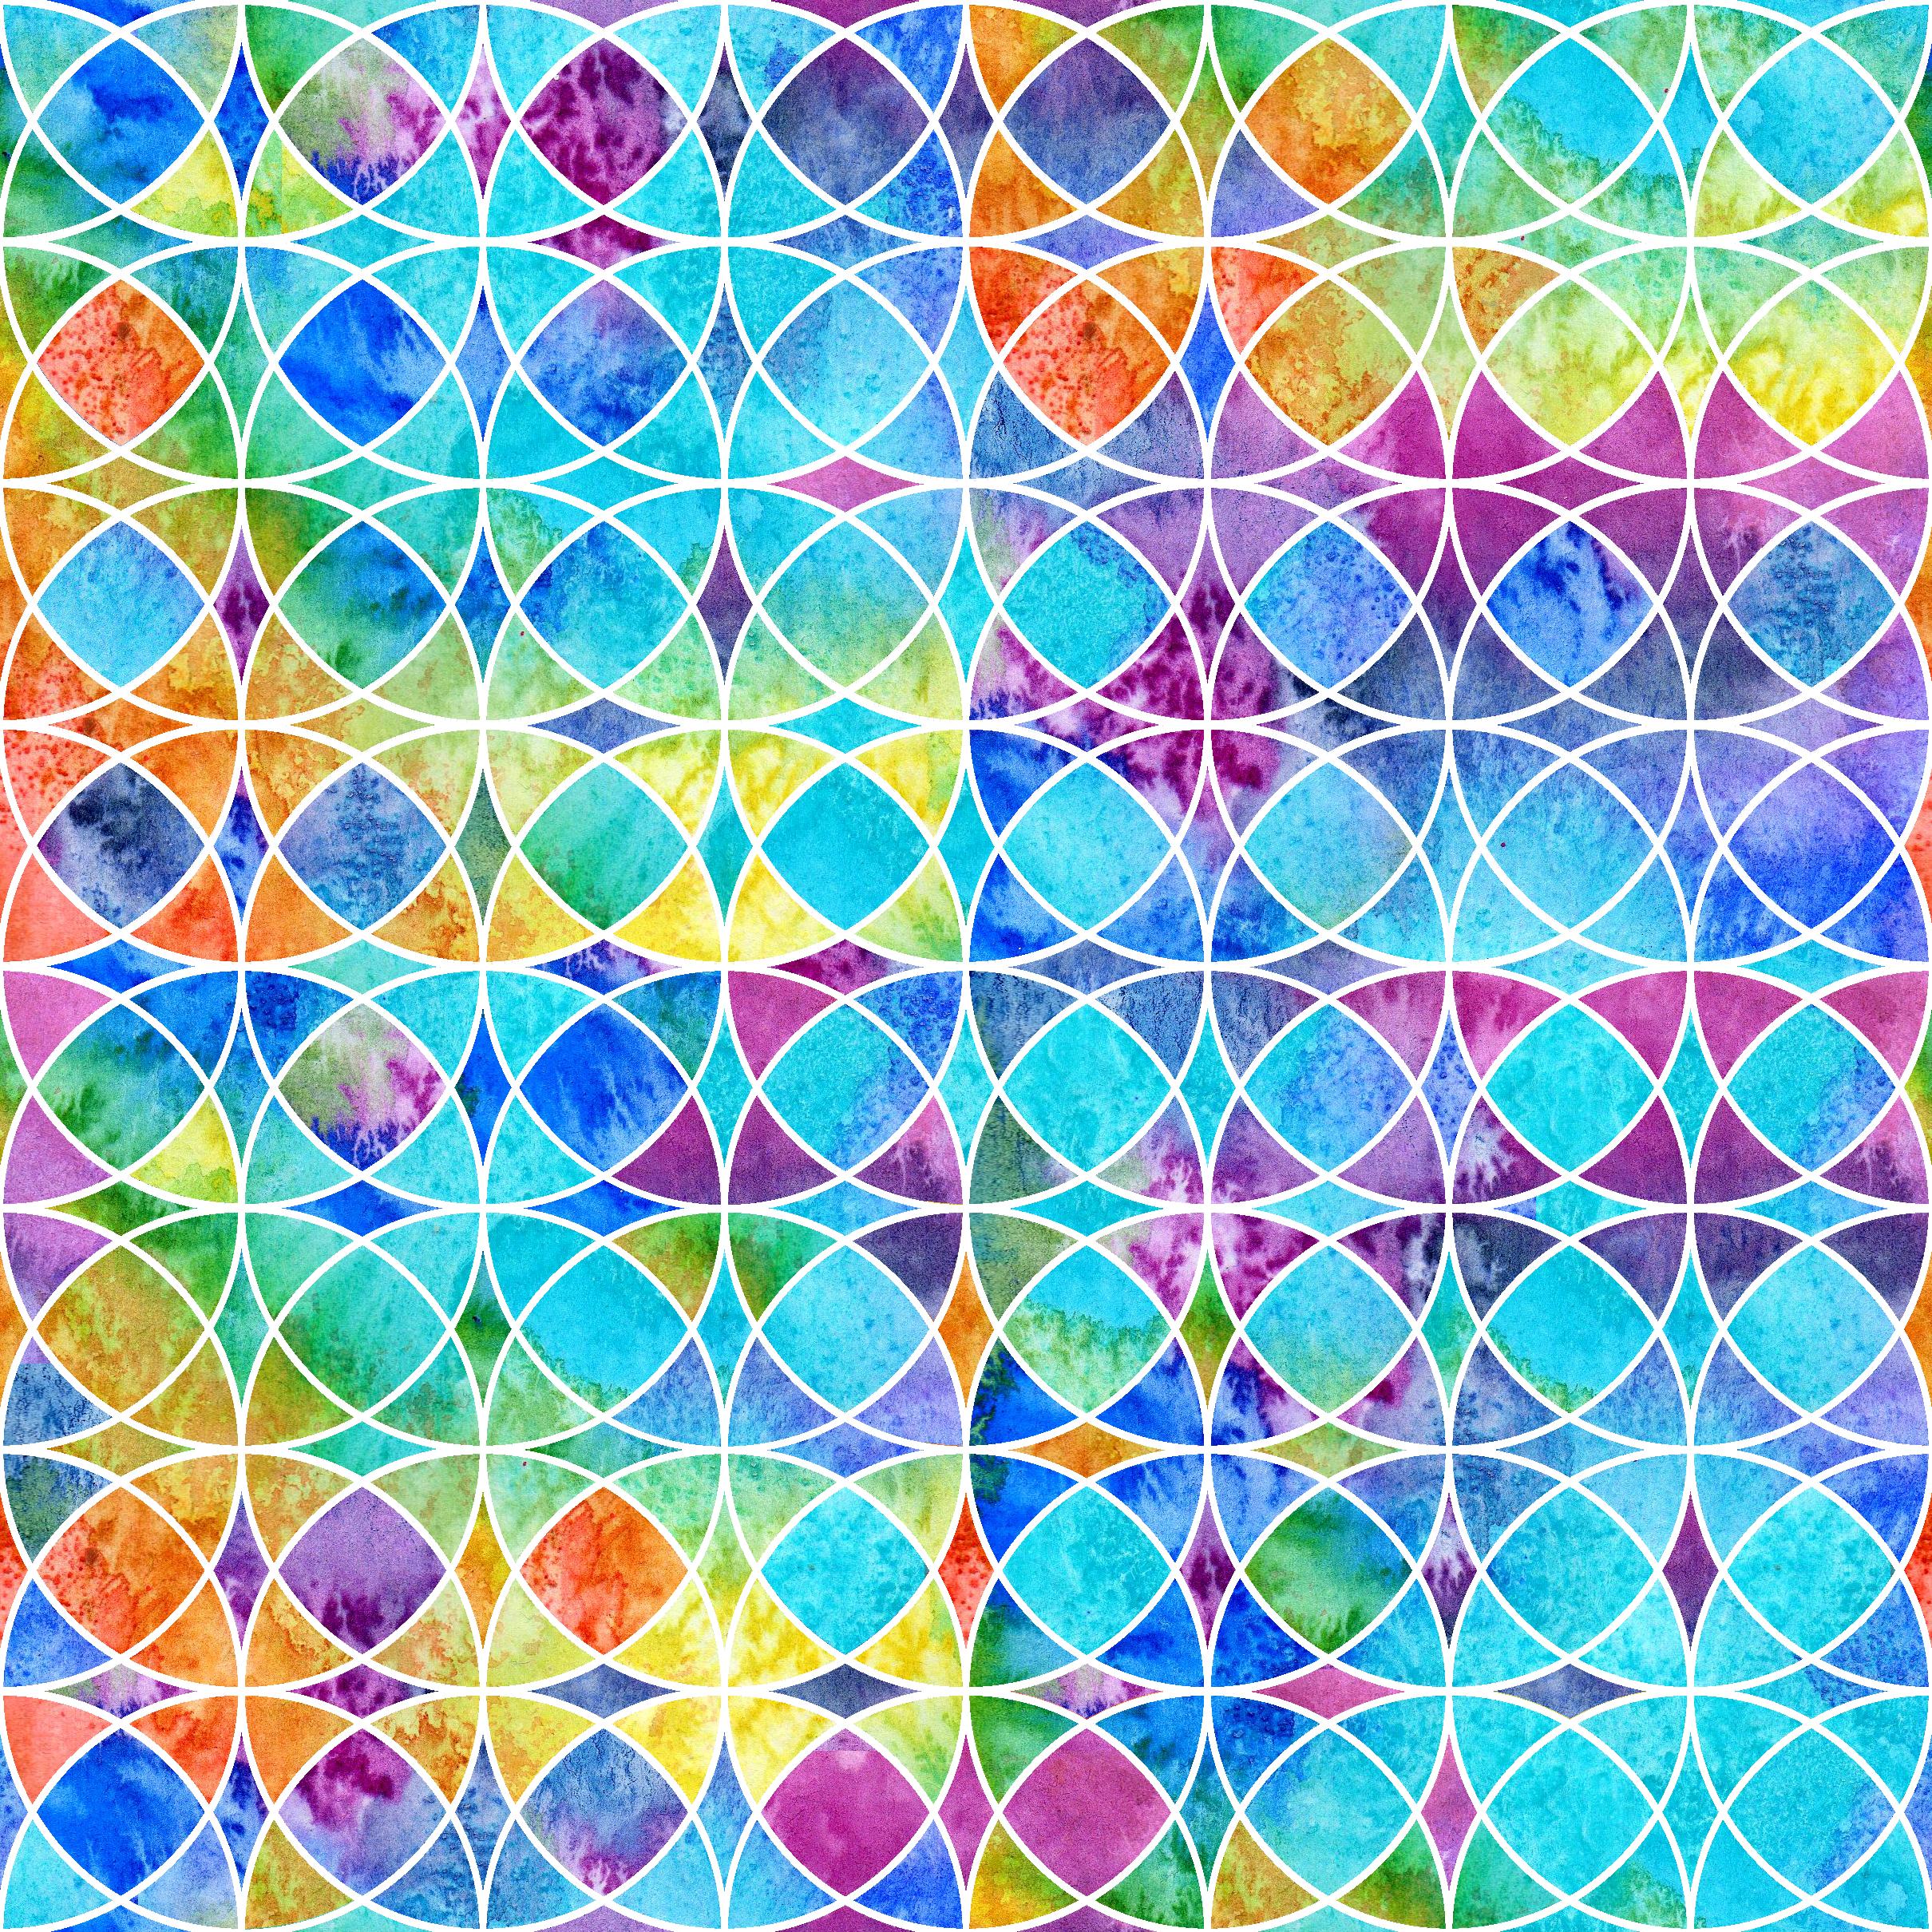 6345705_rcircles.png